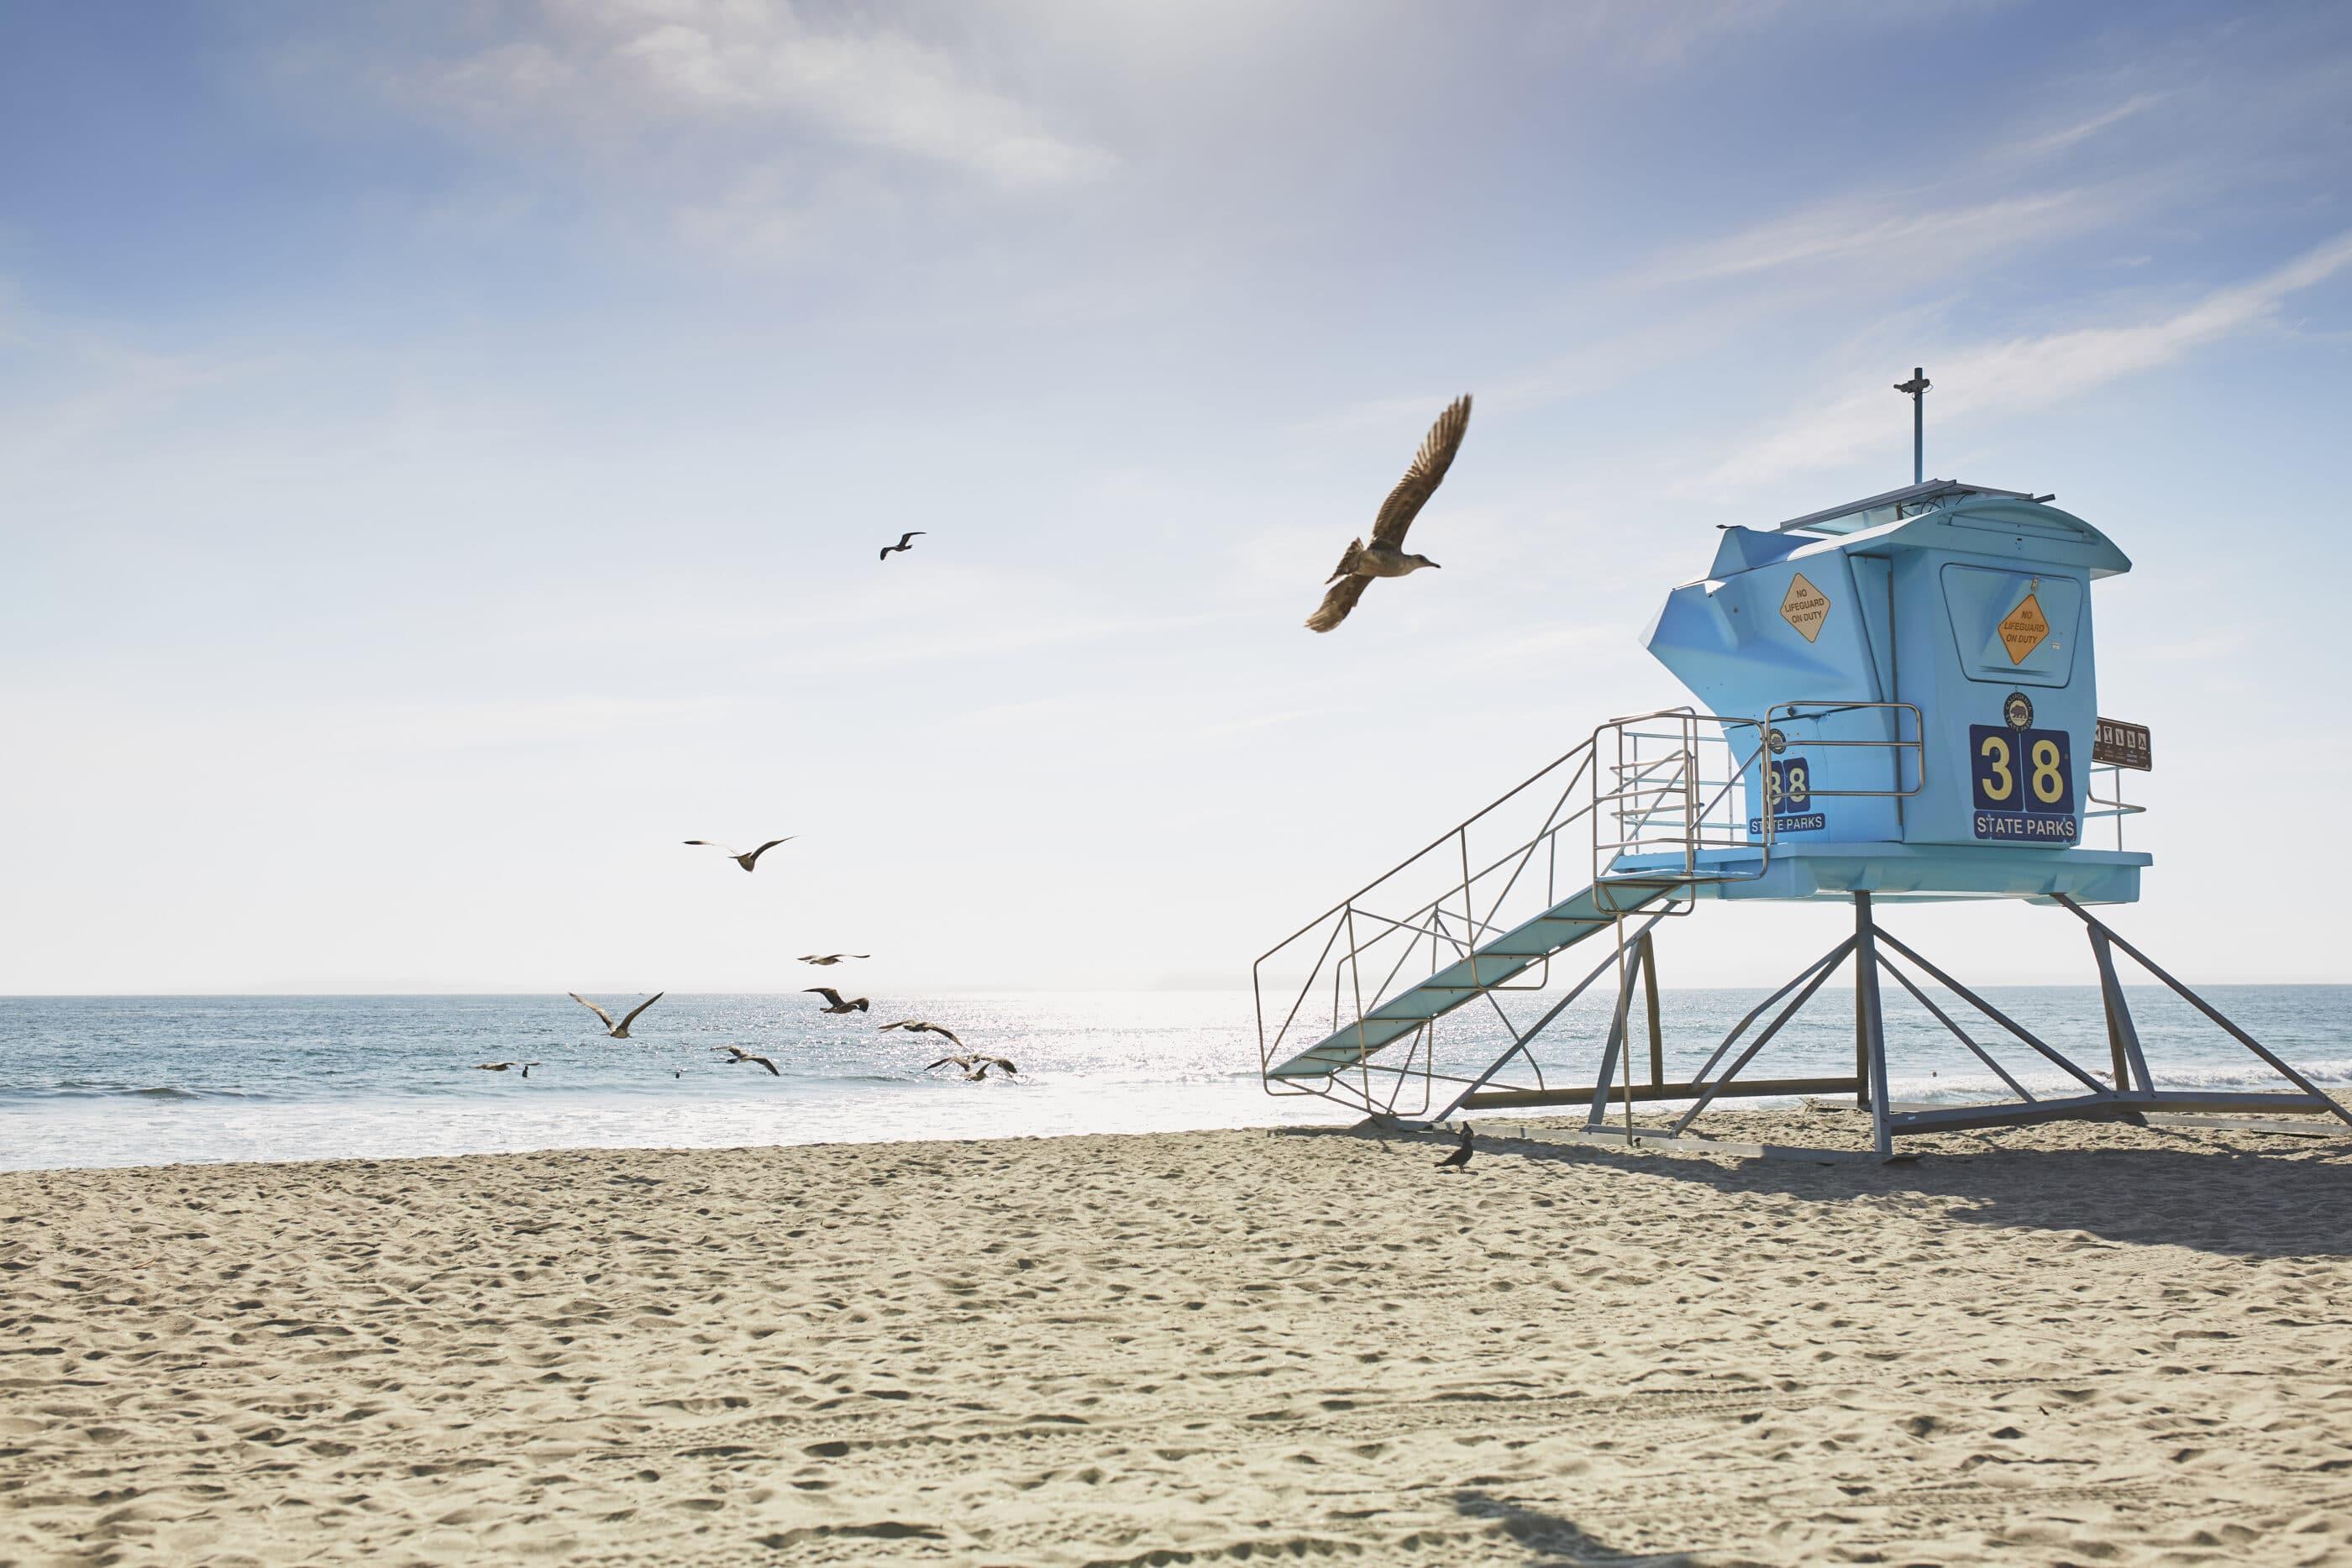 Guide to Carlsbad Beaches: Tamarack STate Beach